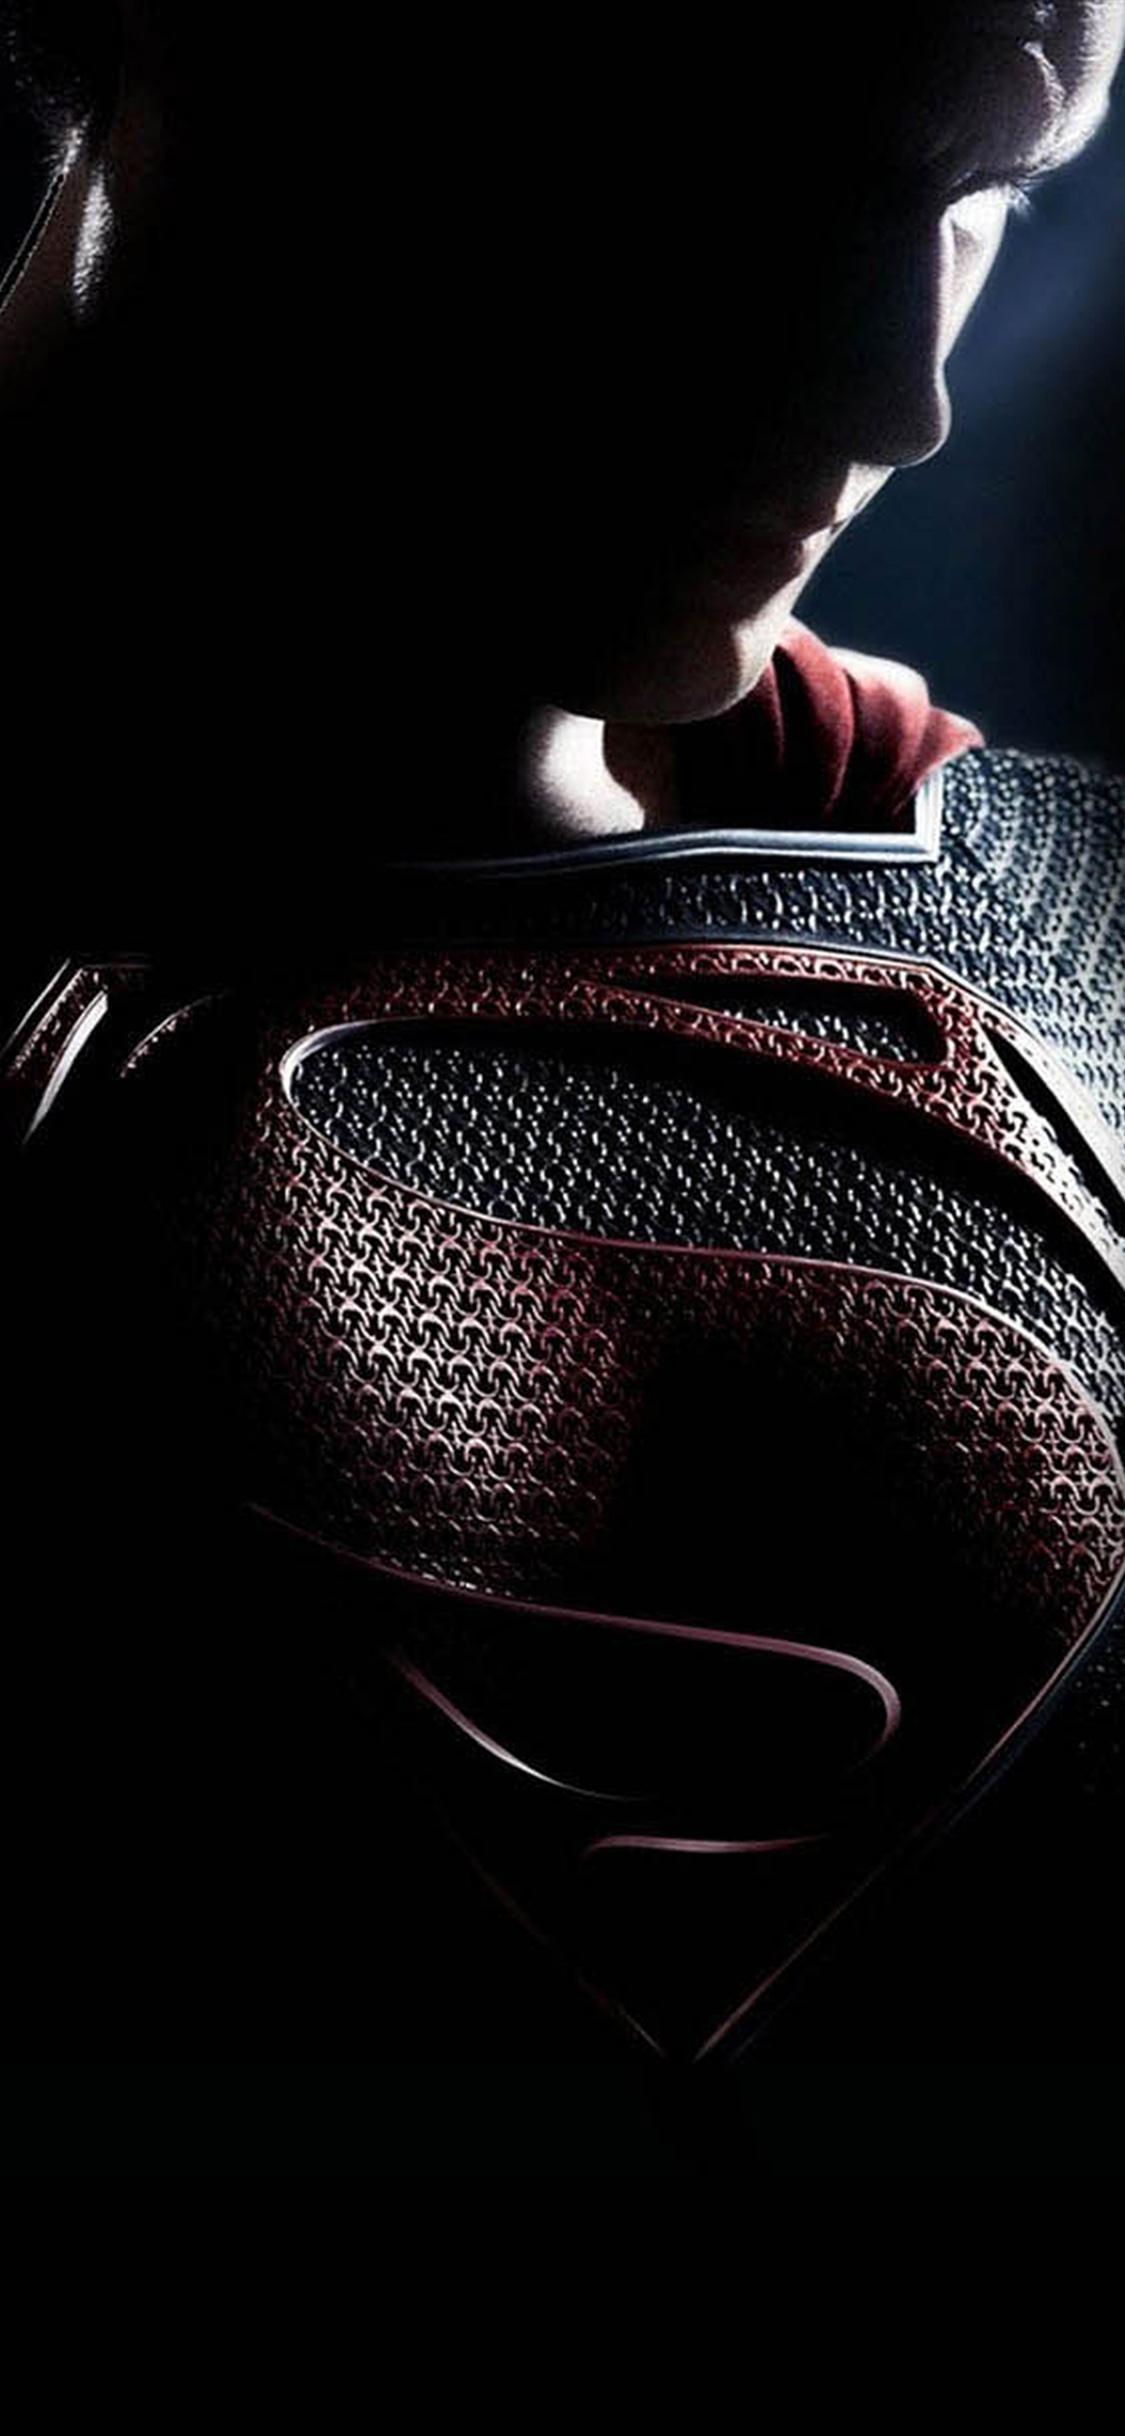 iPhoneXpapers.com-Apple-iPhone-wallpaper-at37-superman-dark-hero-art-illustration